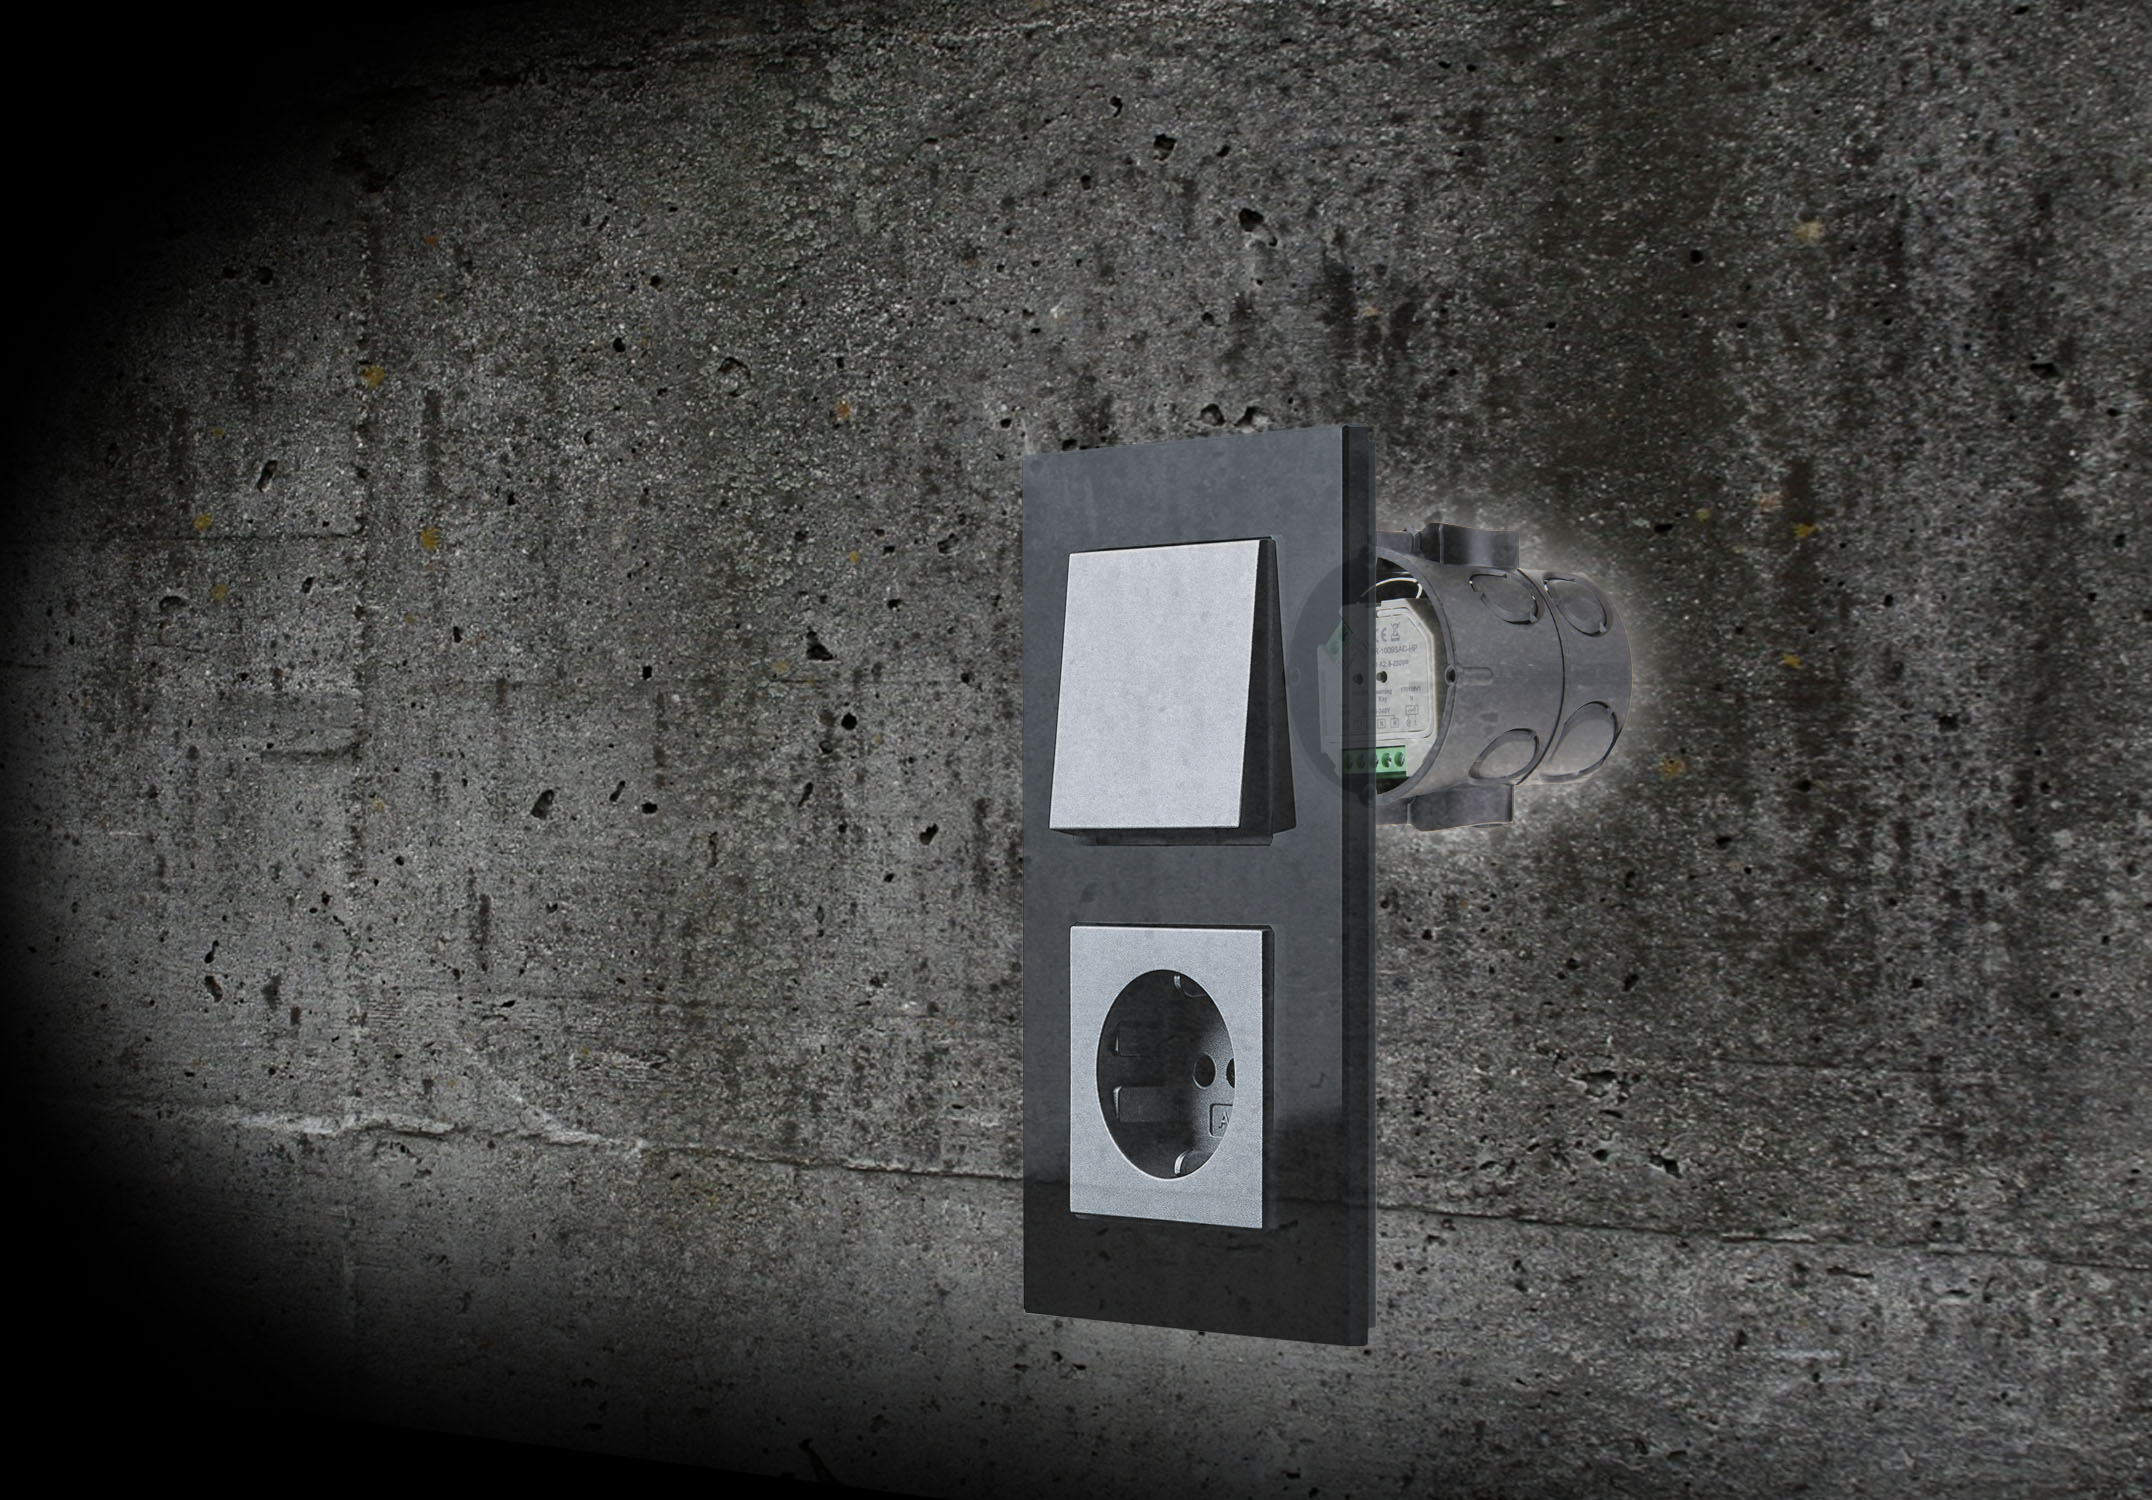 Universal smart dimmer für r l c lasten dimmbare 230v led lampen